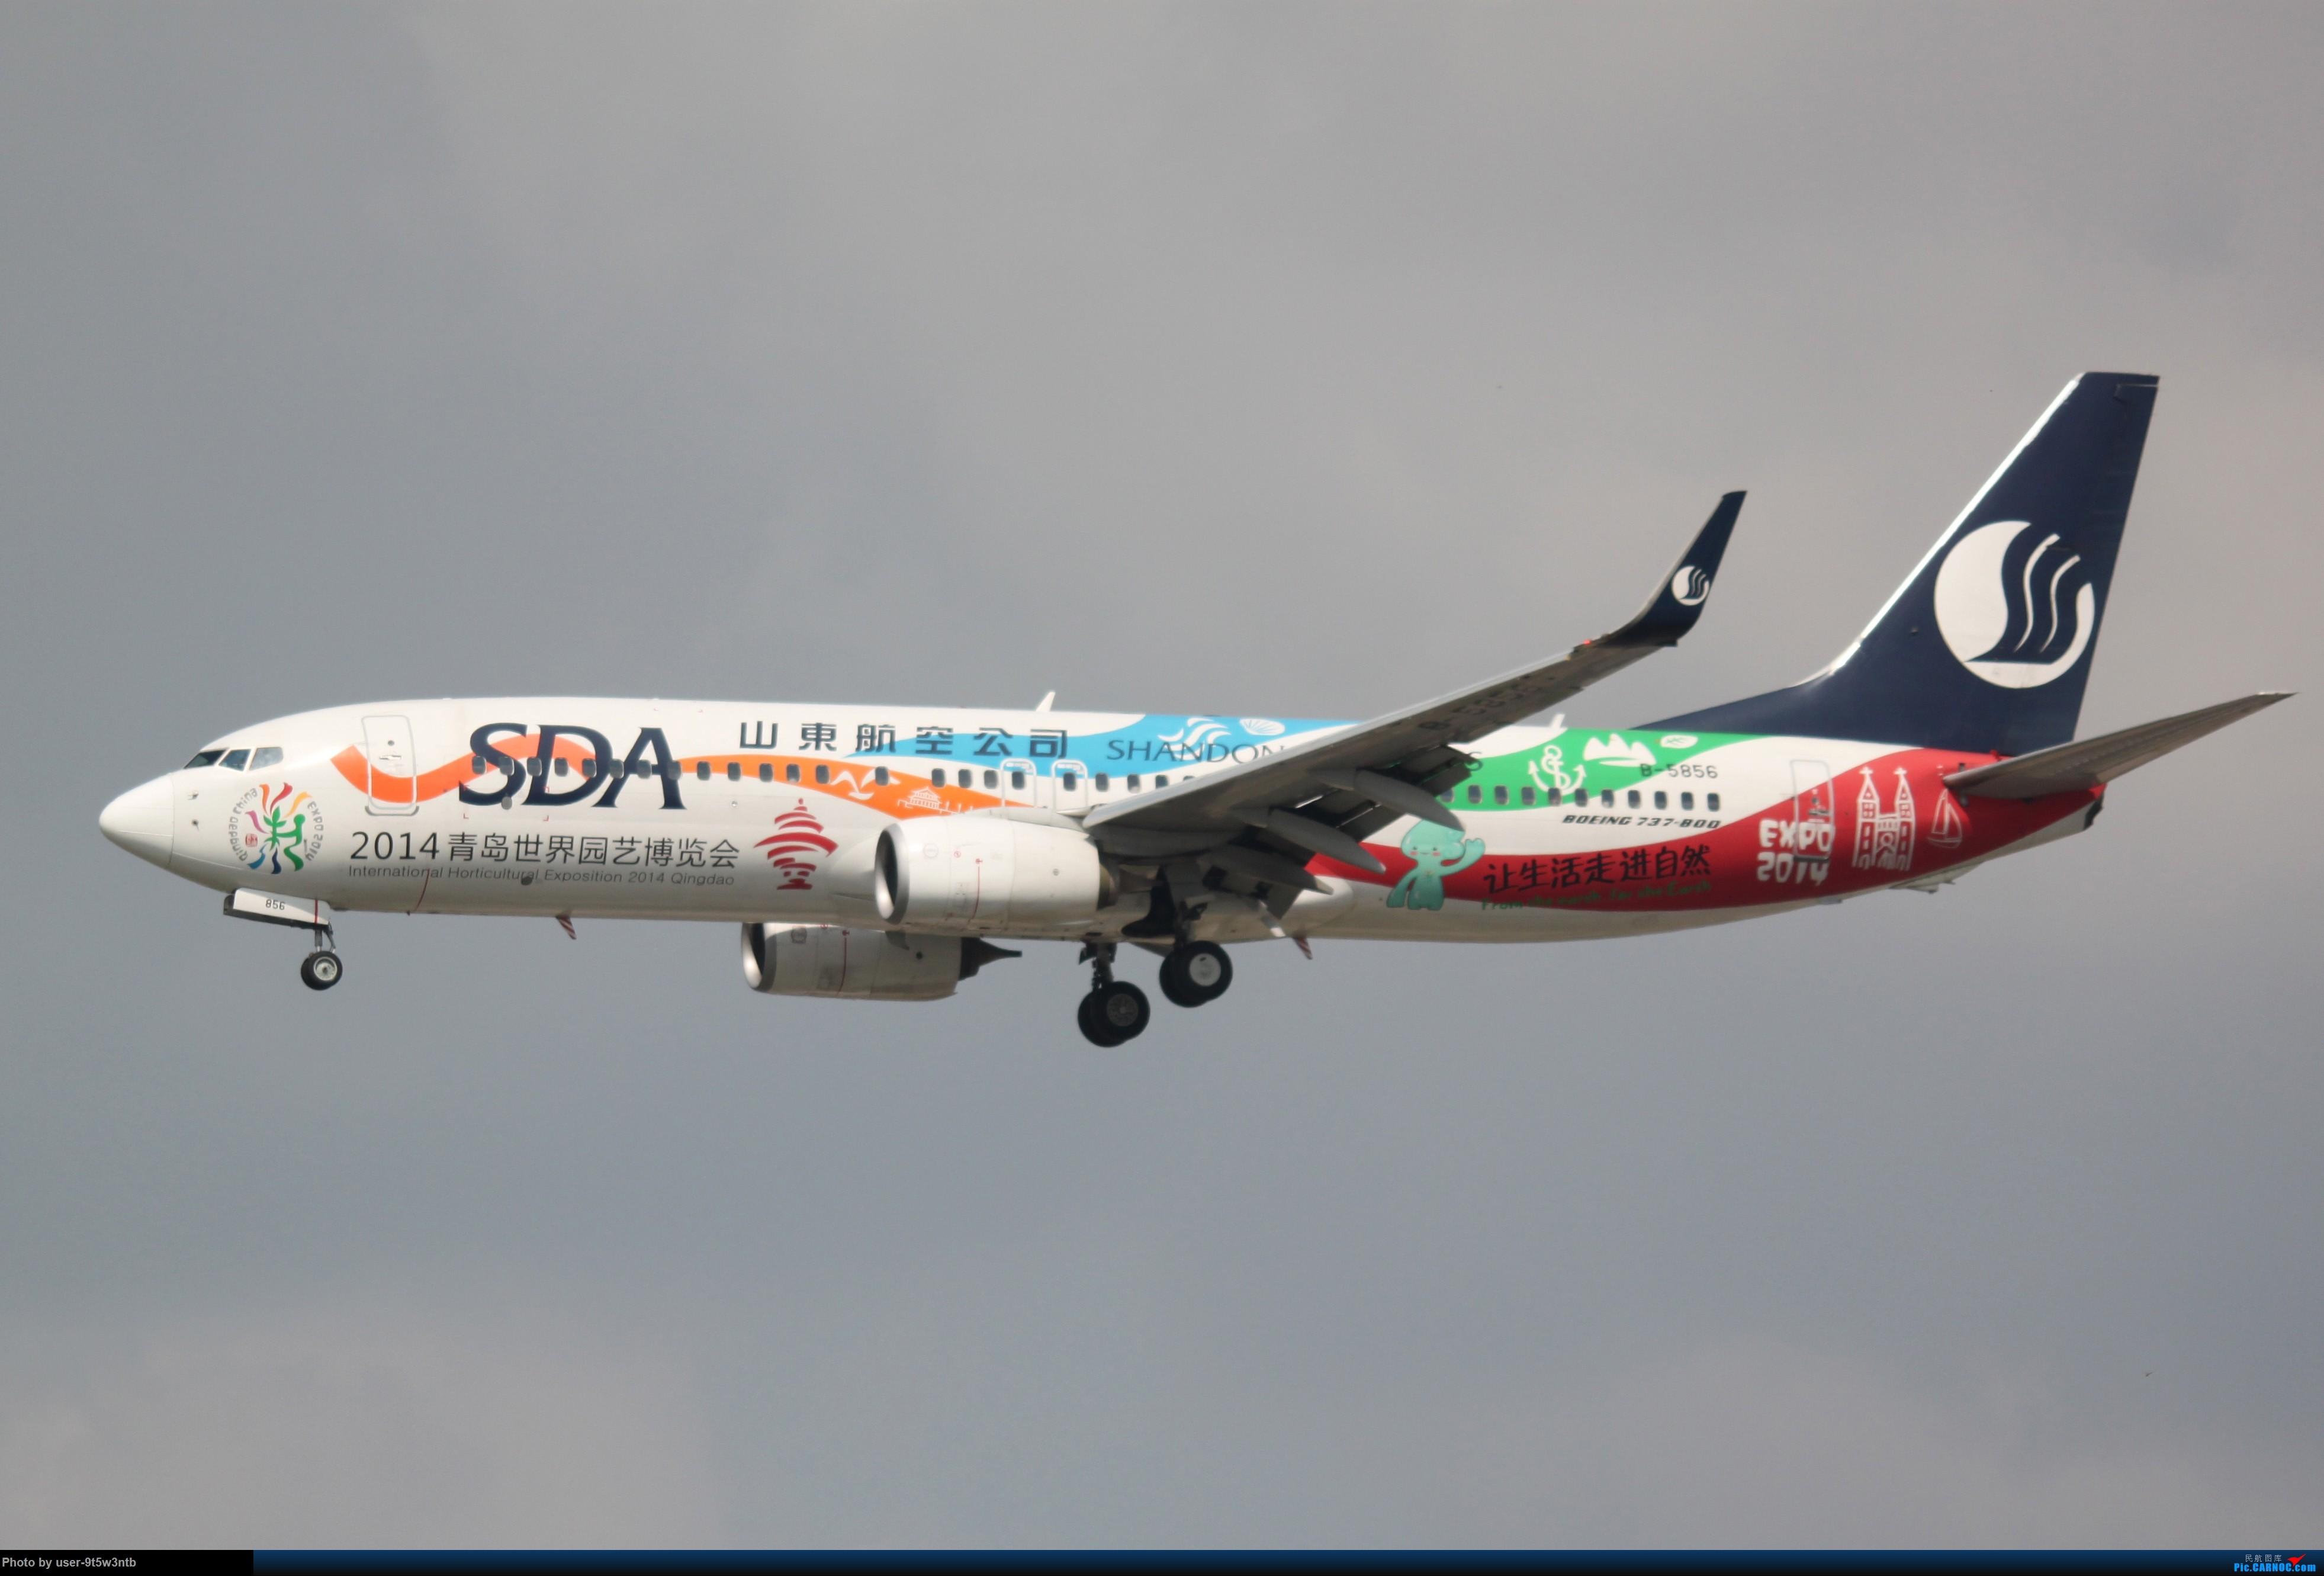 Re:[原创]来整理下最近在虹桥拍到的彩绘机吧~ BOEING 737-800 B-5856 中国上海虹桥国际机场